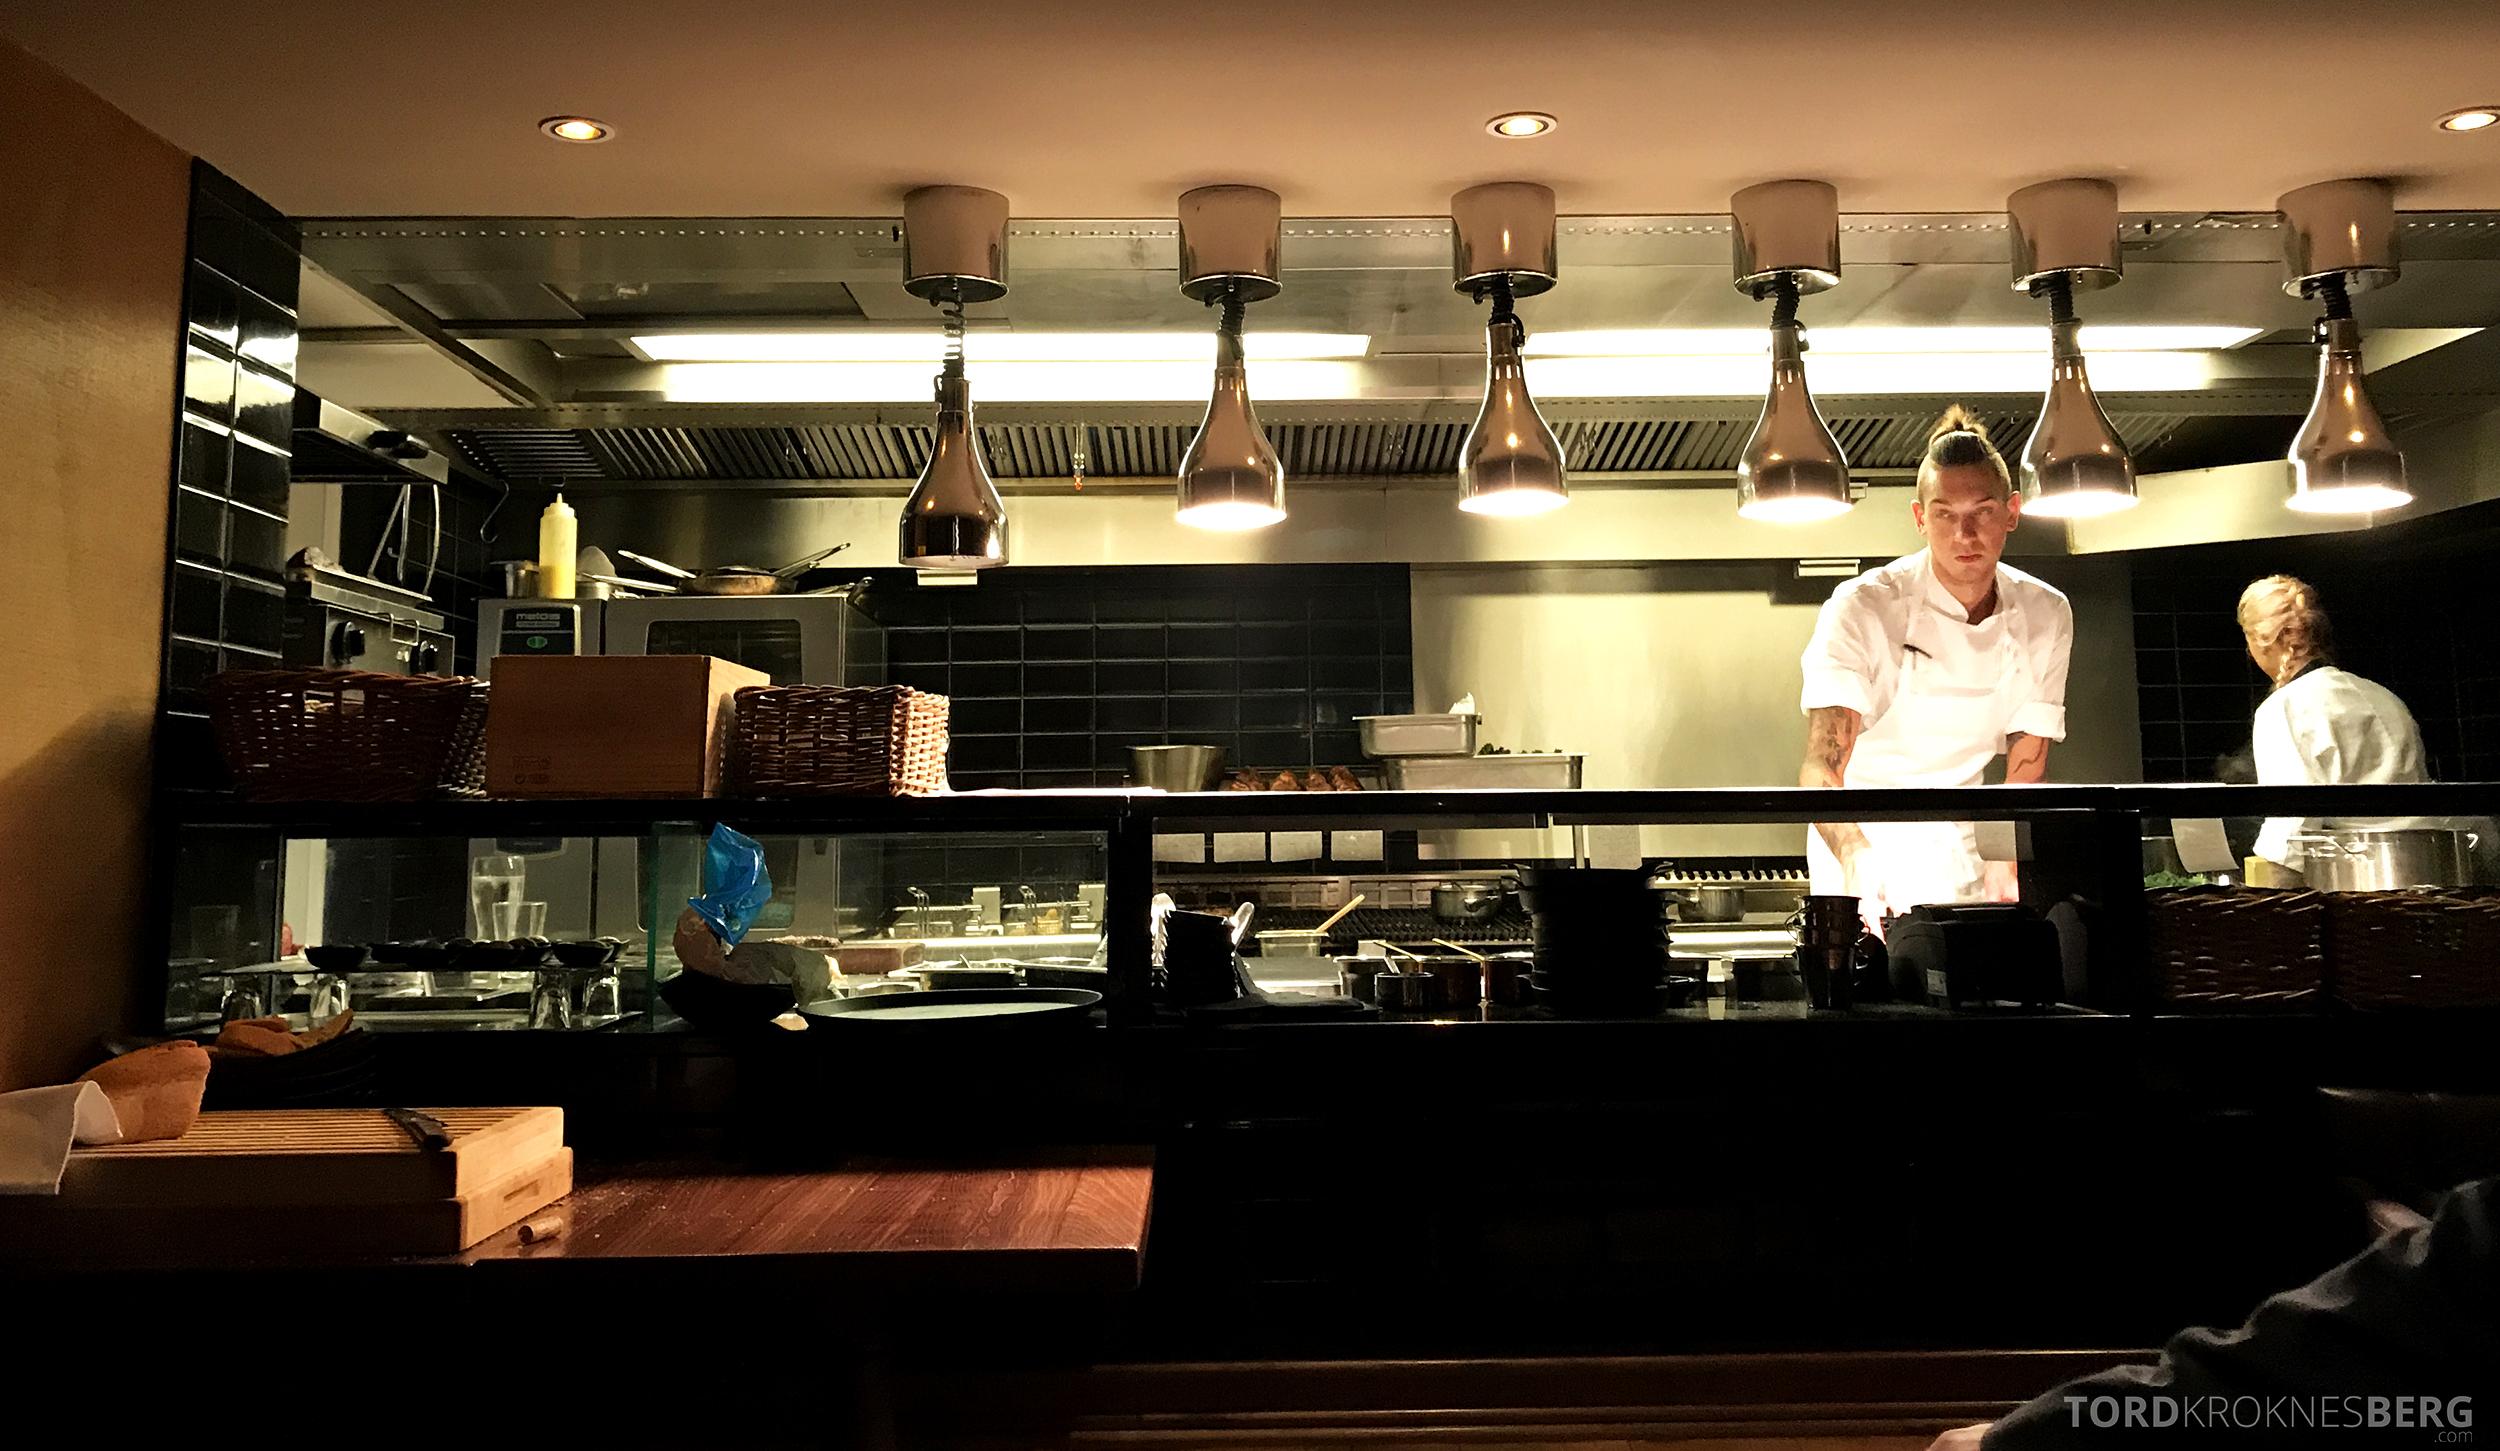 Emilies Eld Restaurant Trondheim åpent kjøkken